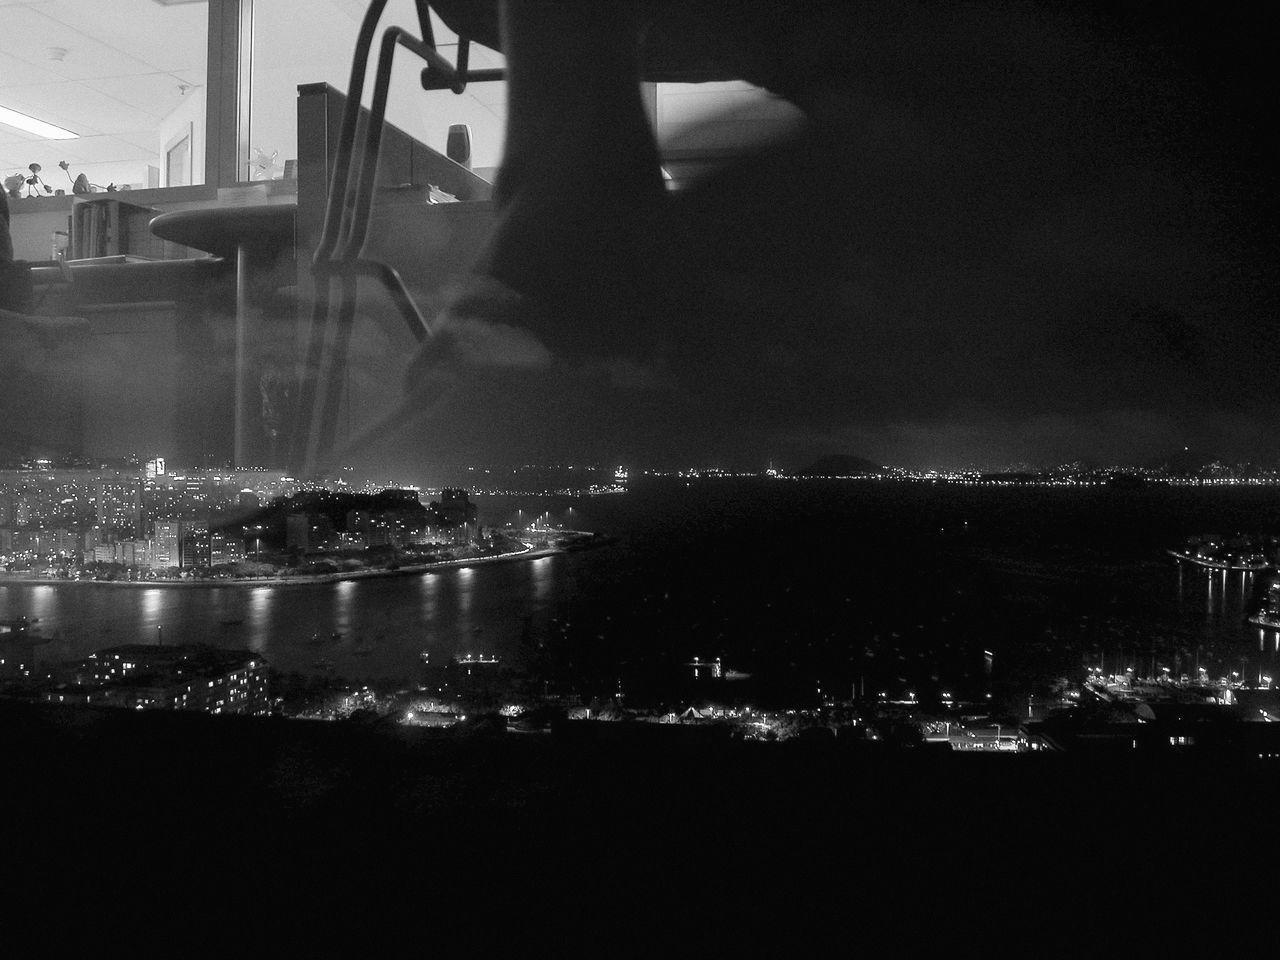 Architecture Baía De Guanabara Blackandwhite Photography City City Life Cityscape Dark Illuminated Modern Night No People Rio De Janeiro Rio De Janeiro Eyeem Fotos Collection⛵ Sky Late-night Work Office View Through The Window Cities At Night